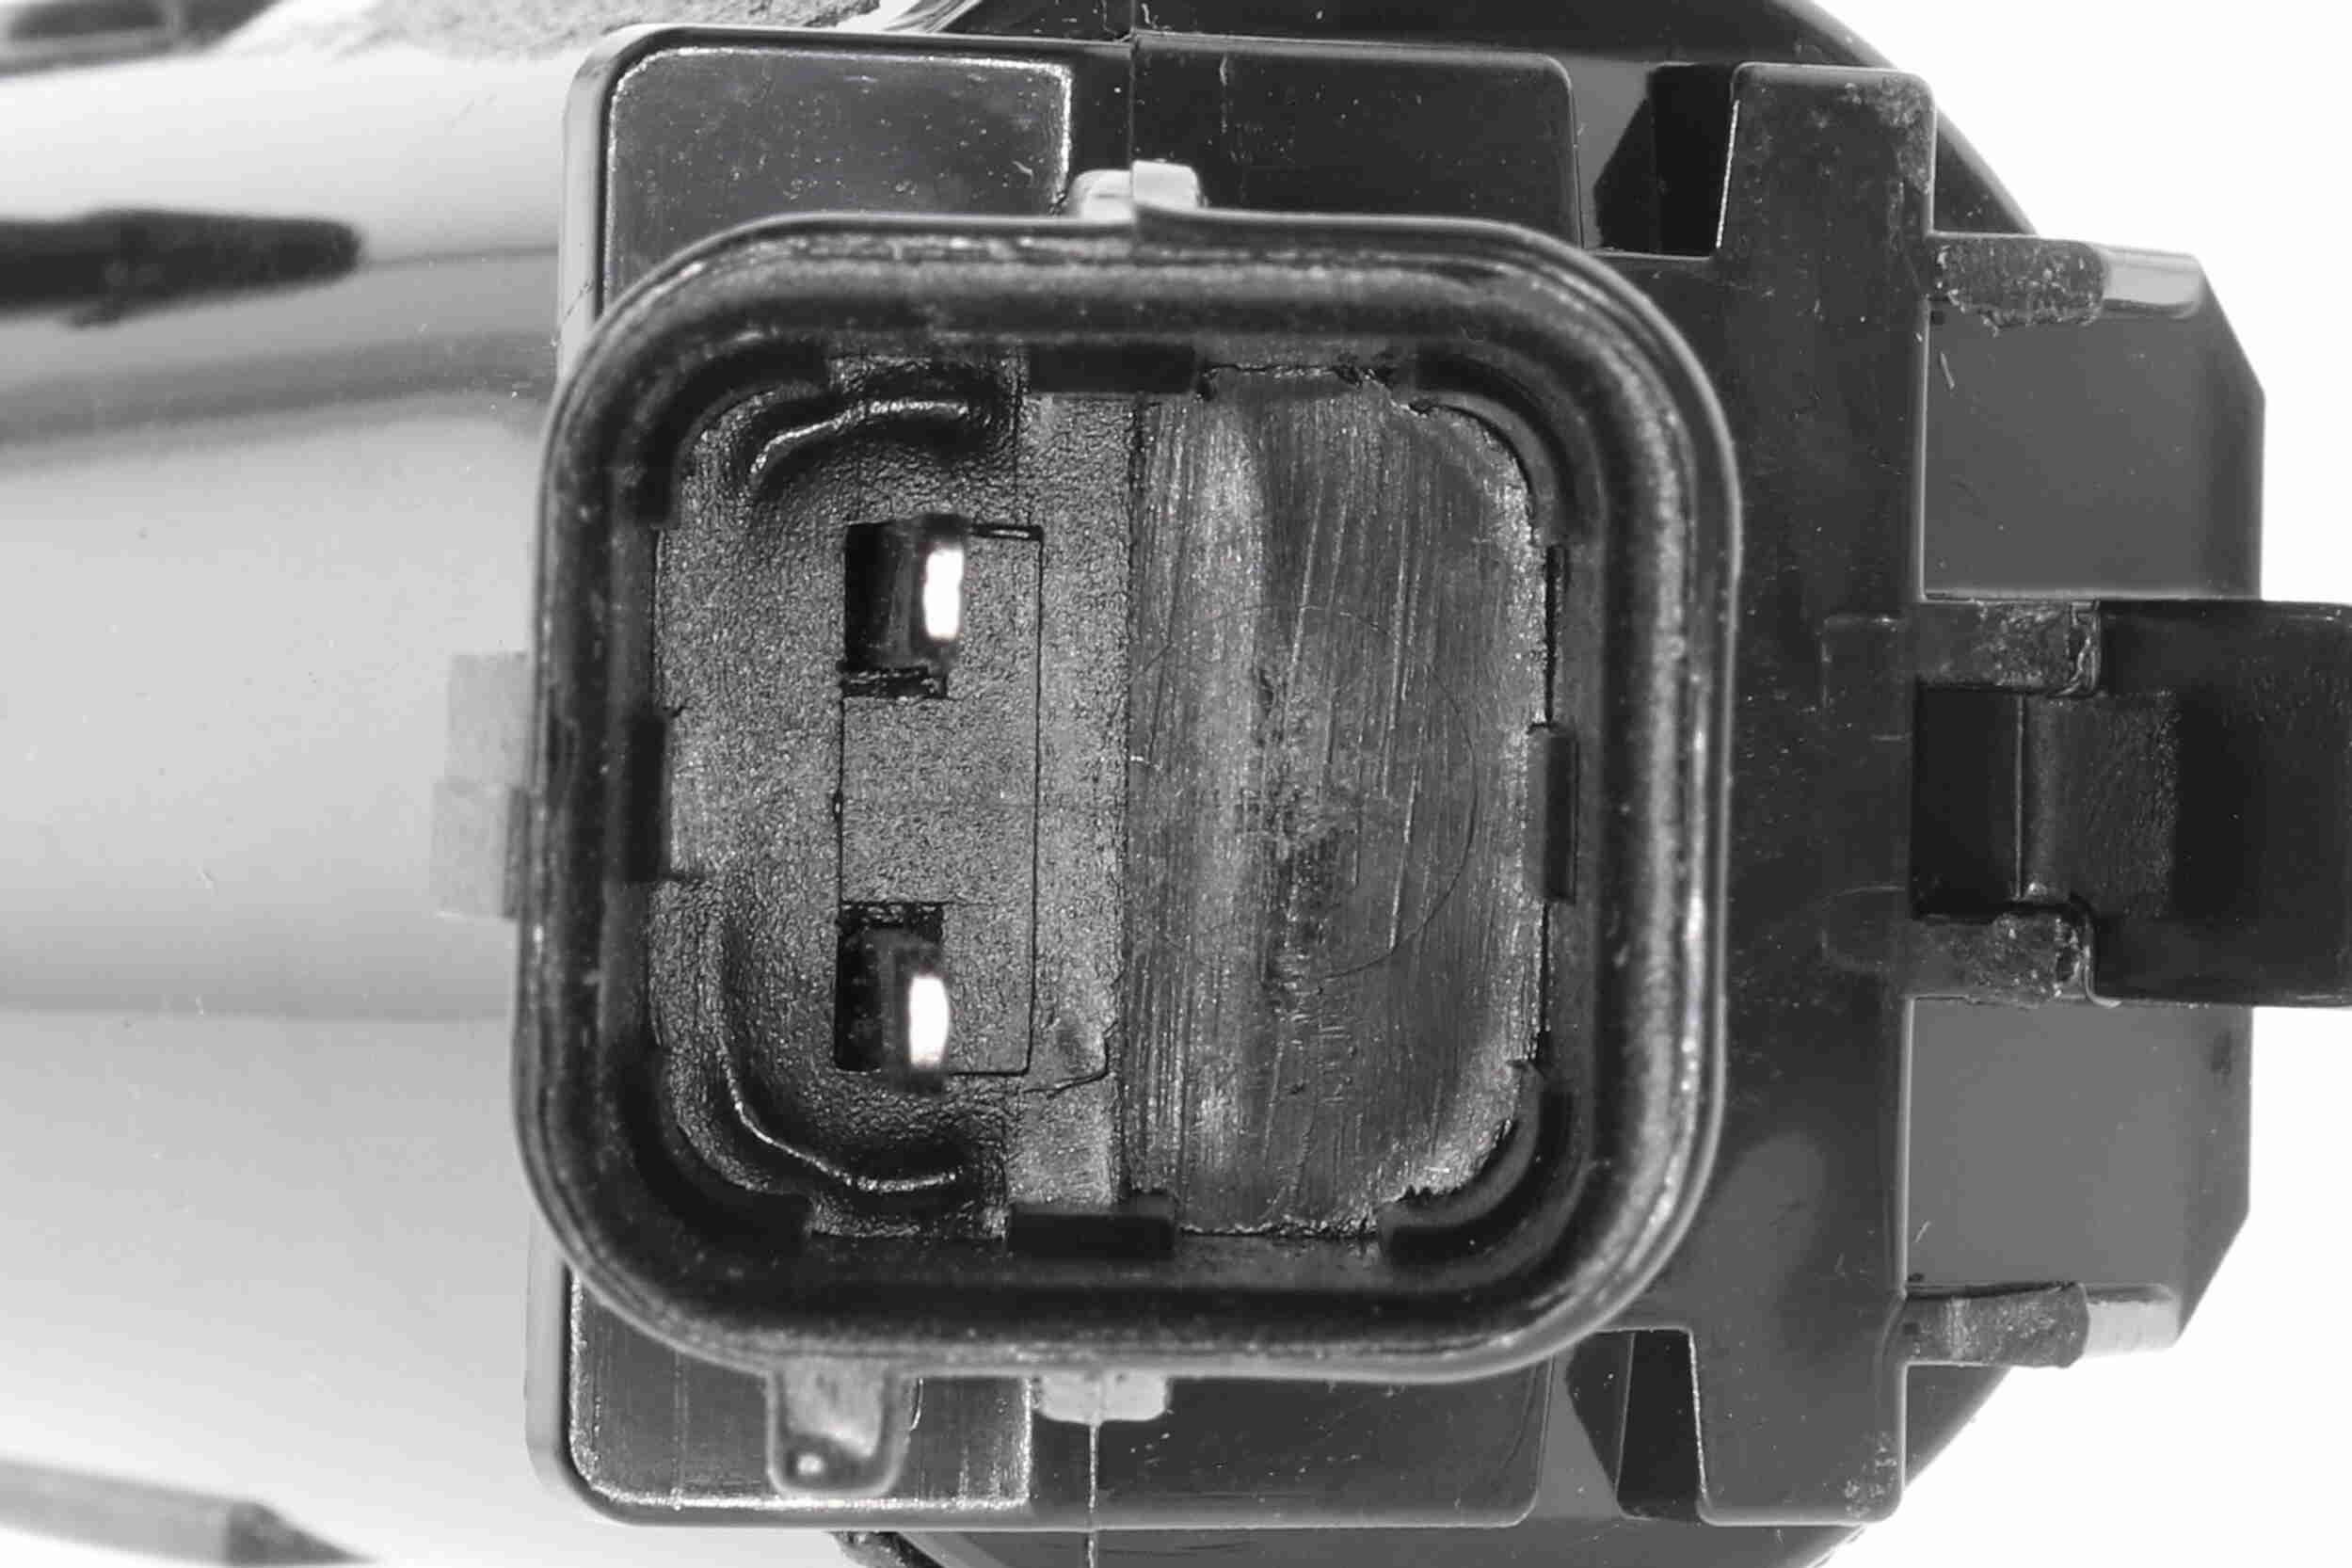 Washer Pump ACKOJA A52-08-0012 rating